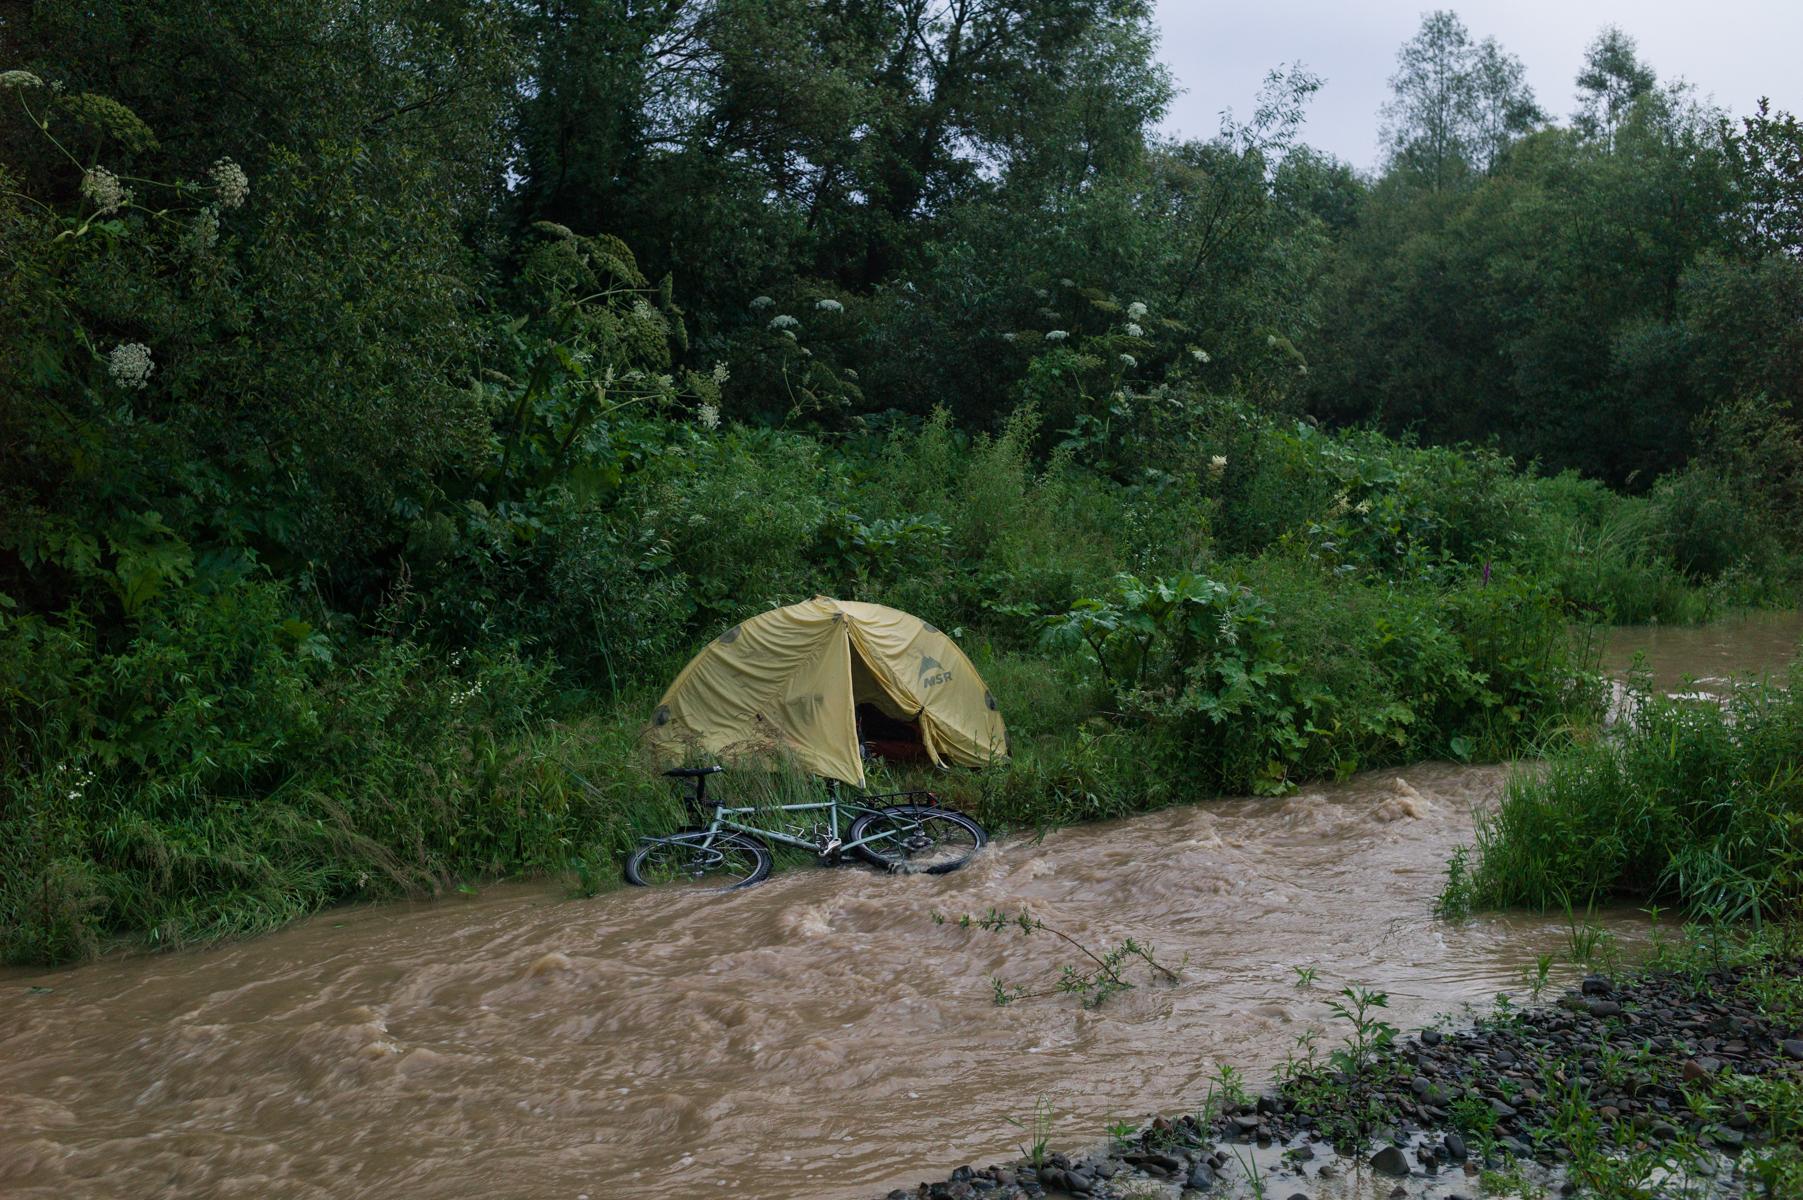 Close to Poroshkovo, June 26th